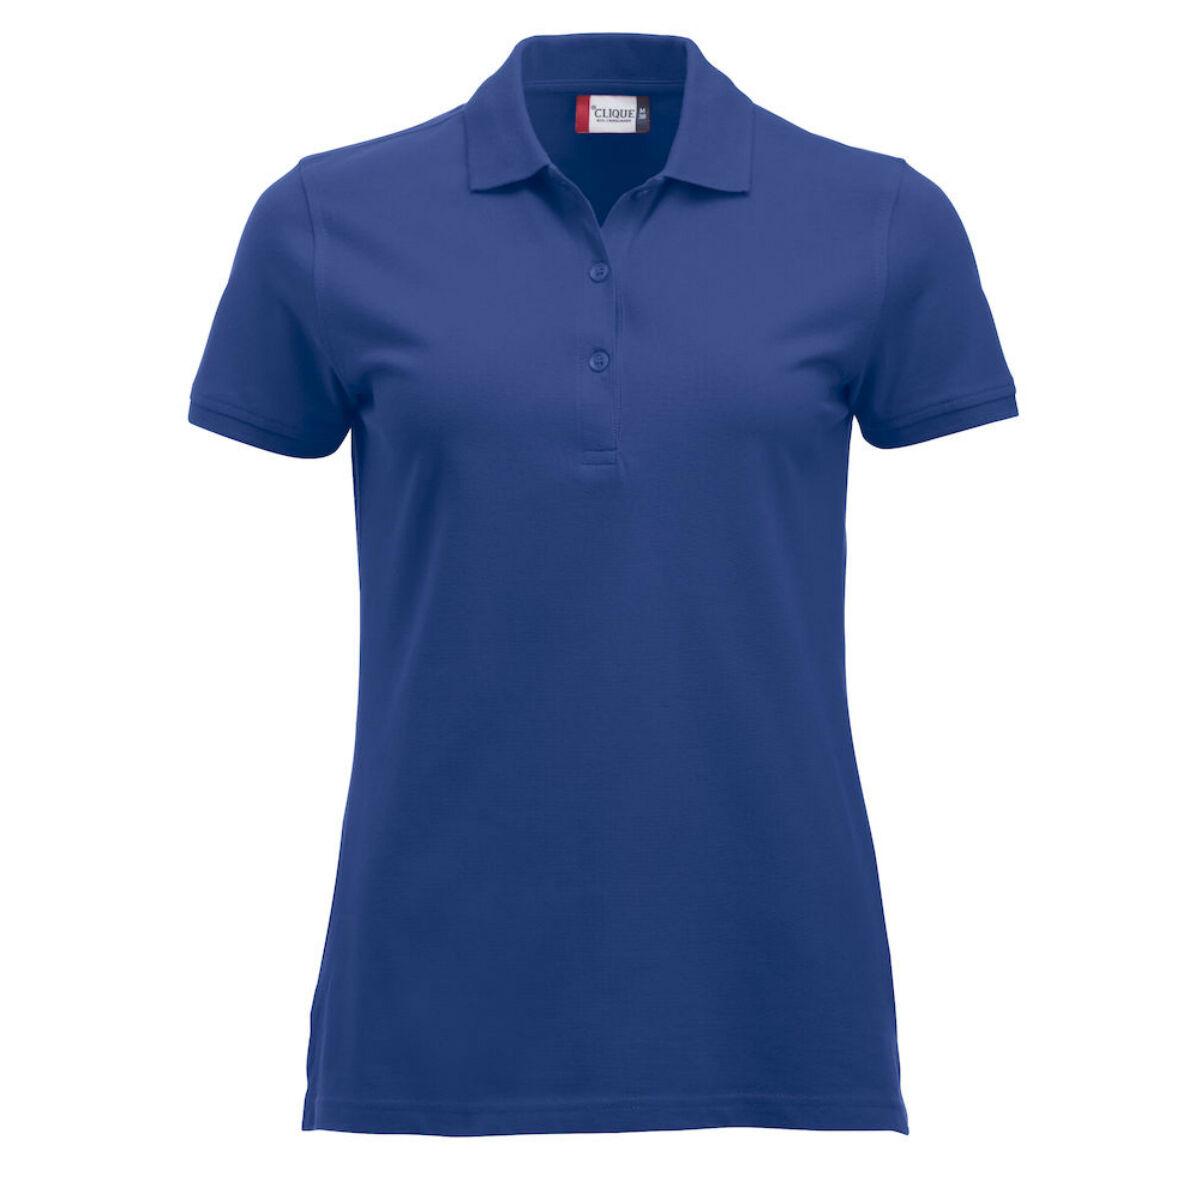 Unisex Clique Classic Polo Shirt (Ladies Blue)